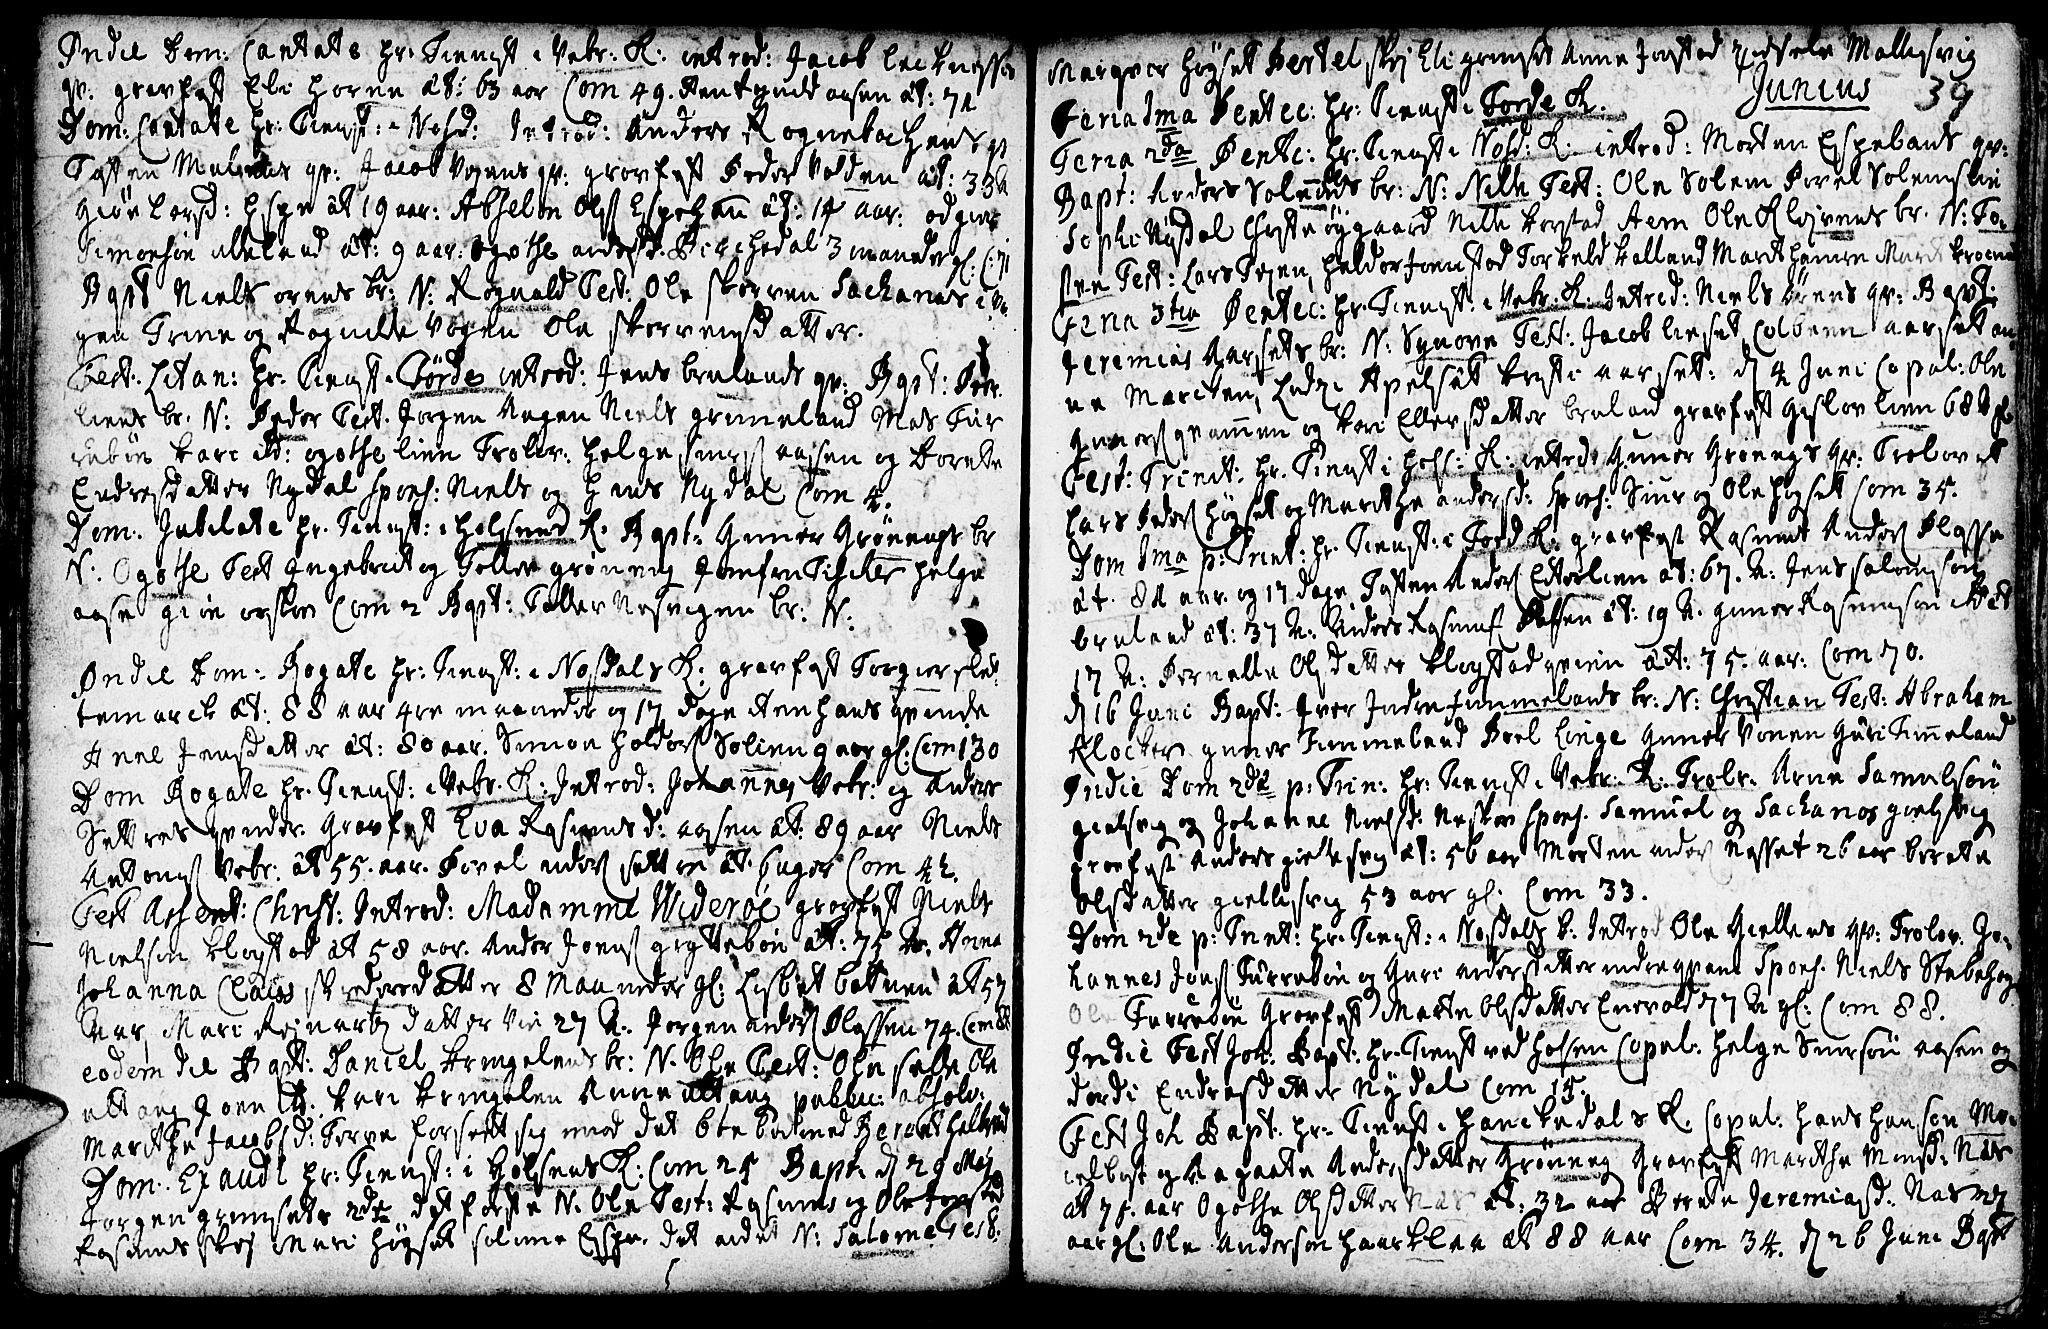 SAB, Førde sokneprestembete, H/Haa: Ministerialbok nr. A 2, 1728-1748, s. 39